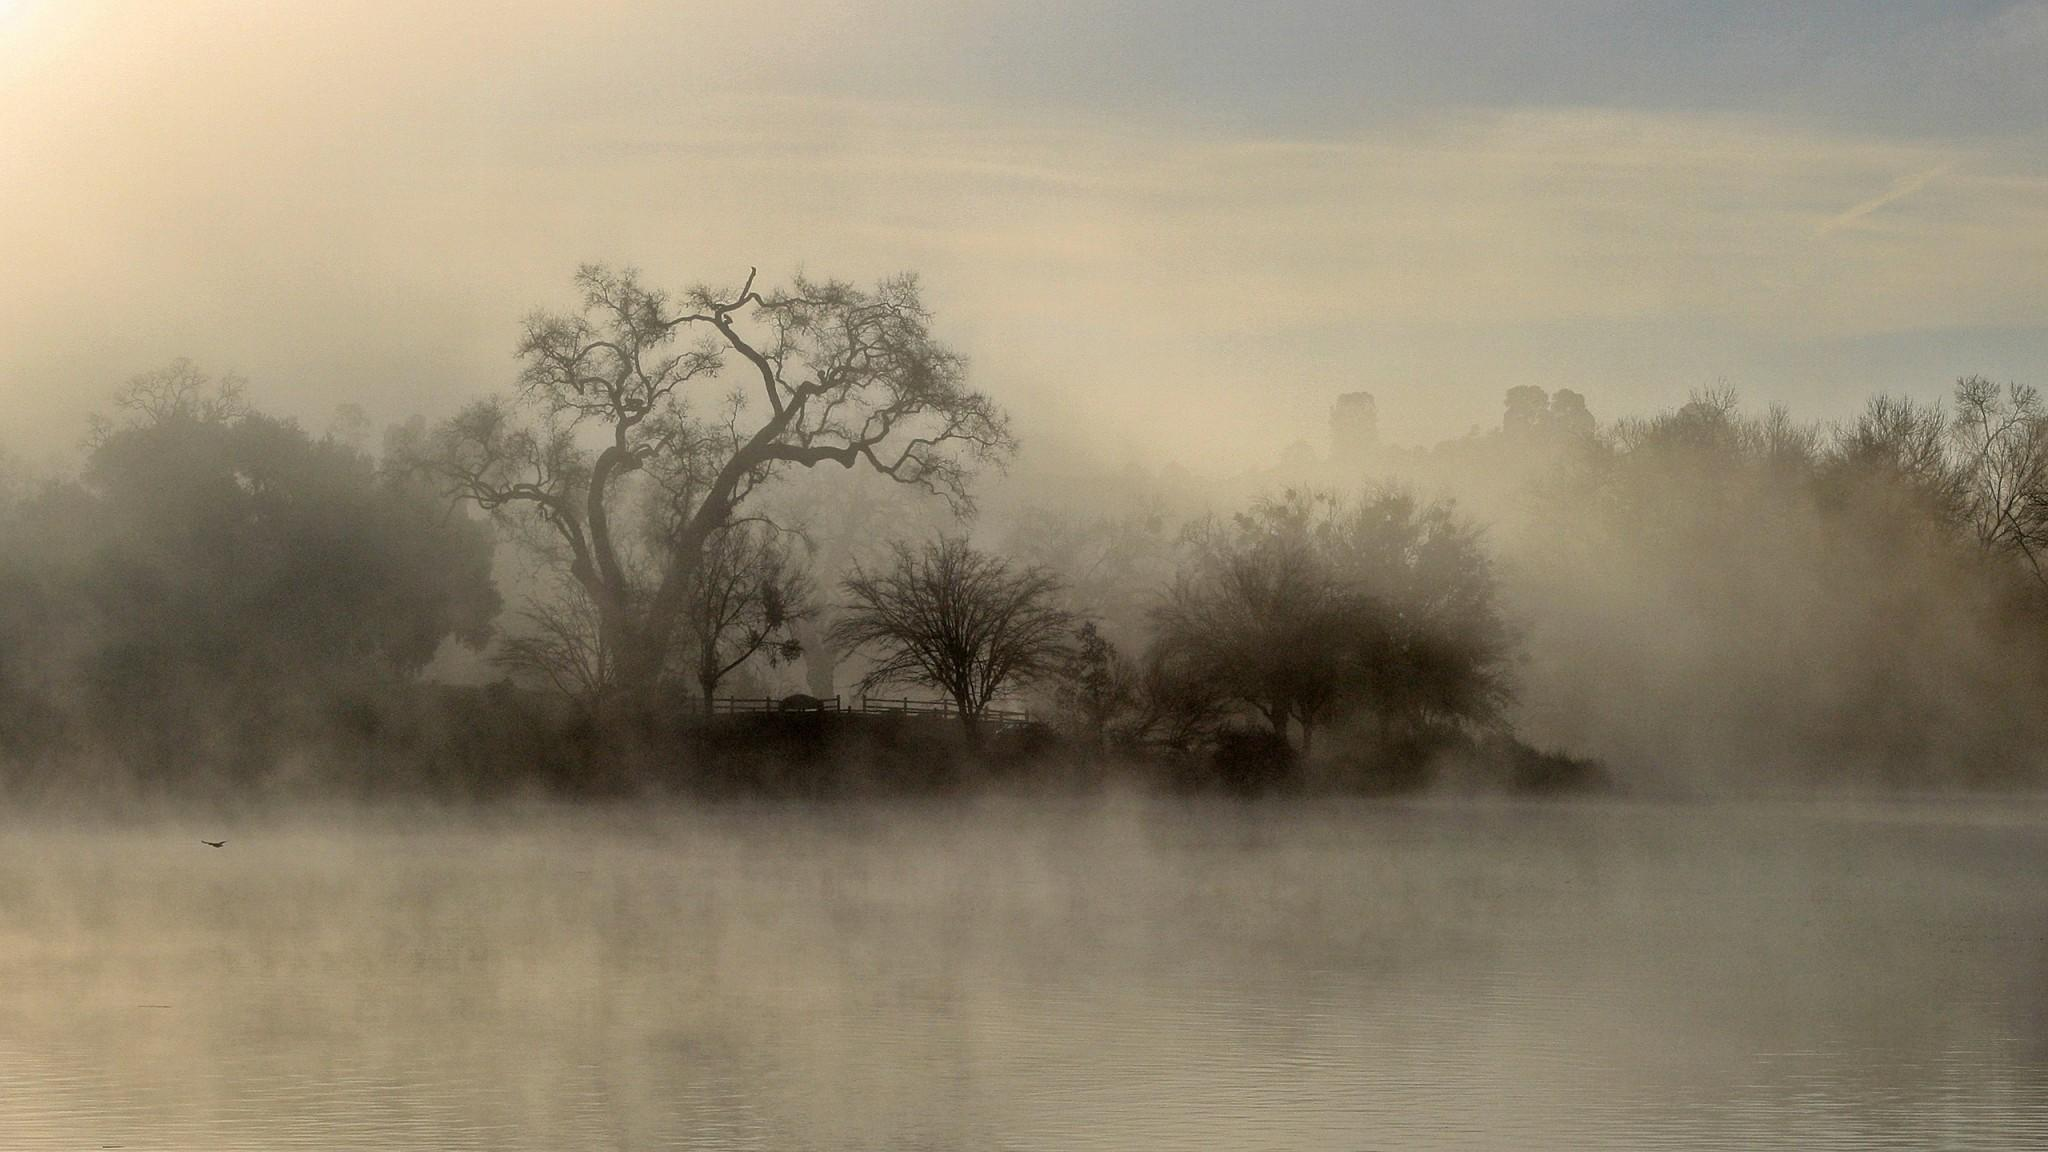 ... Mist Wallpaper · Mist Wallpaper